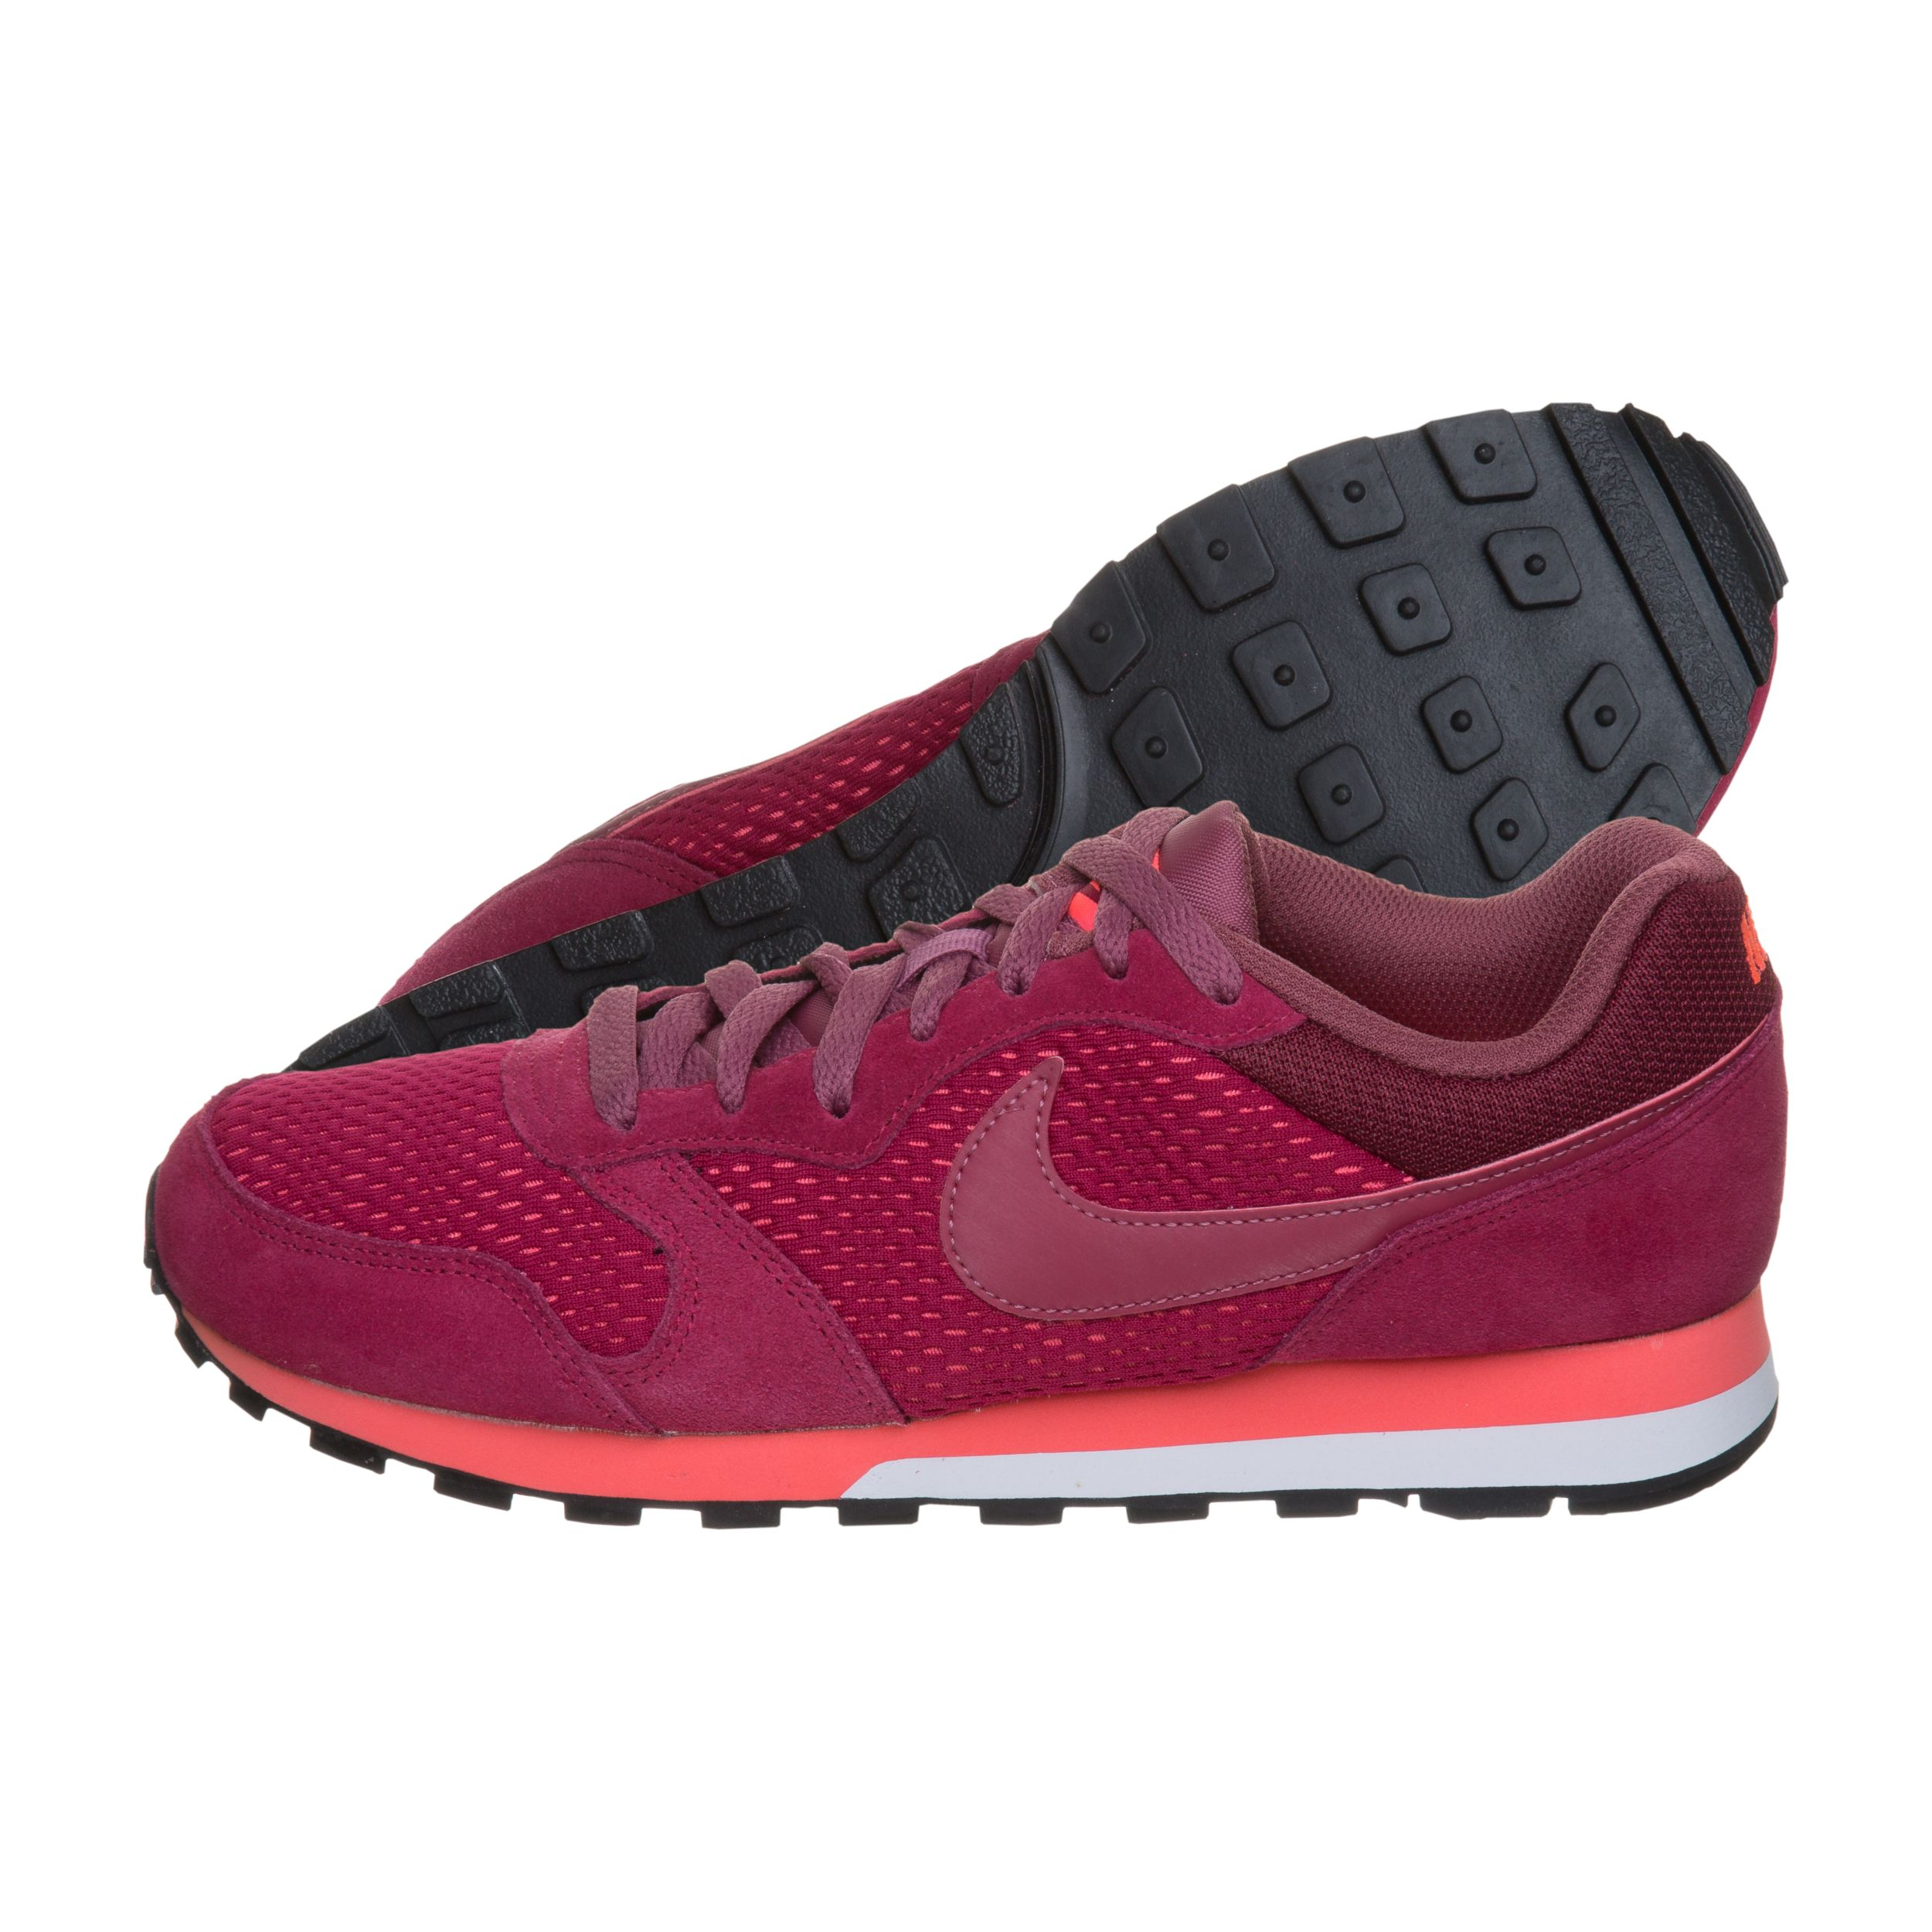 Nike Damen MD Runner 2 Sneakers, Rot (Noble Re D Port Hot Punch), 36.5 EU